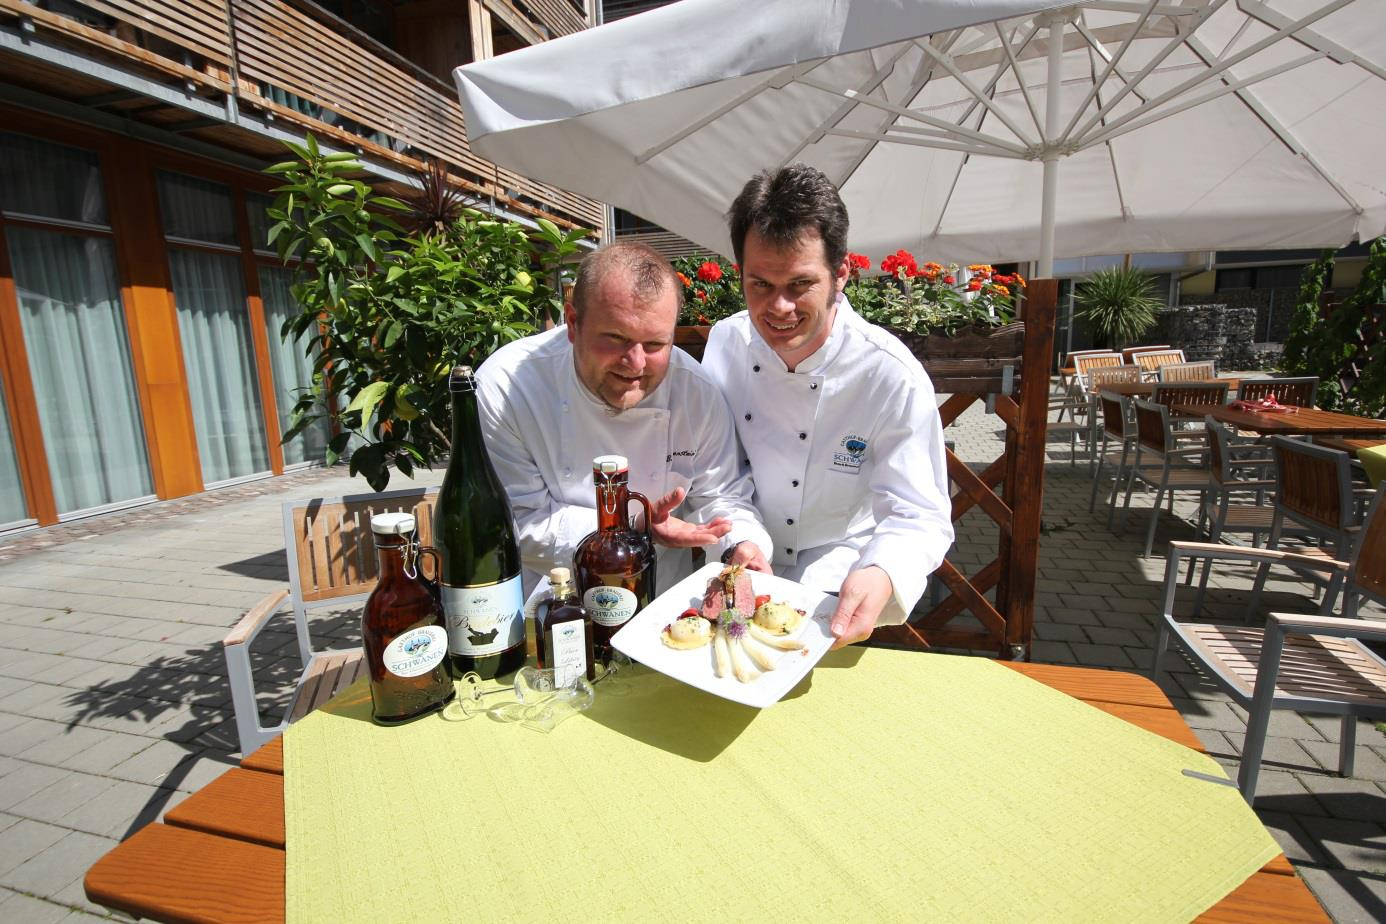 Schwanen-Ehingen-Gasthof-Brauerei-Kulinarik-das-Konzept-Team